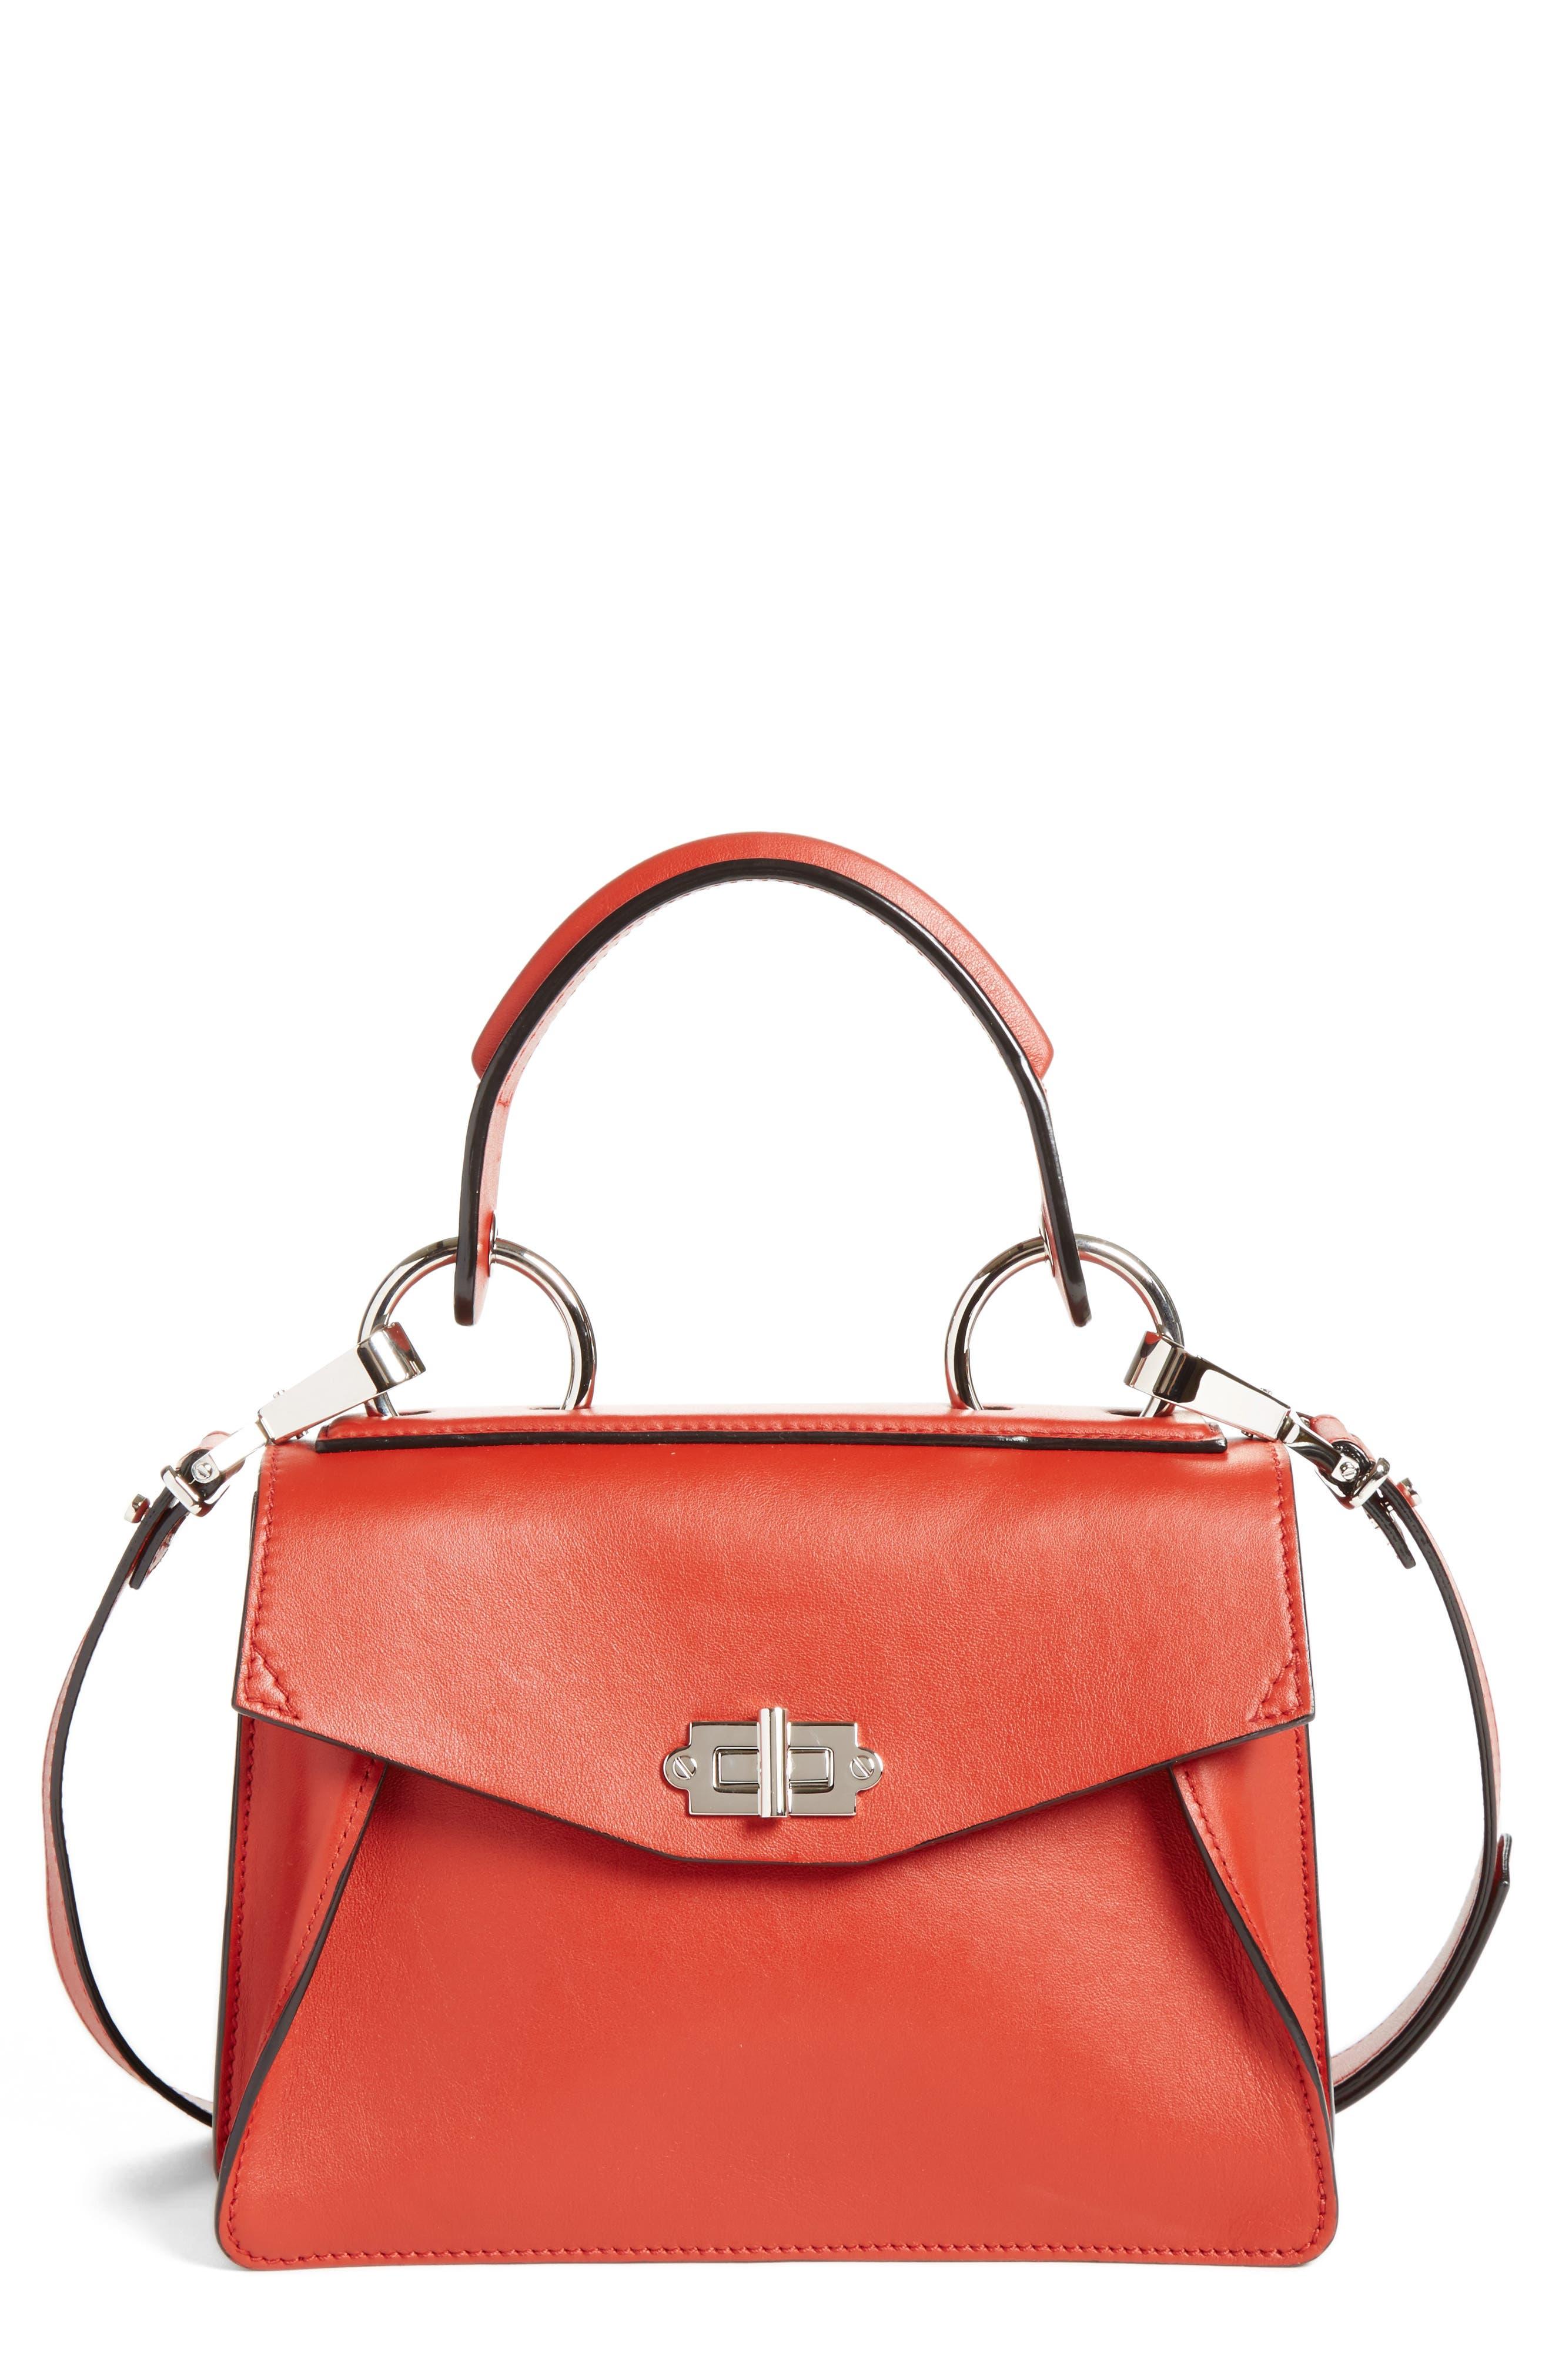 'Small Hava' Top Handle Calfskin Leather Satchel,                         Main,                         color, Brick